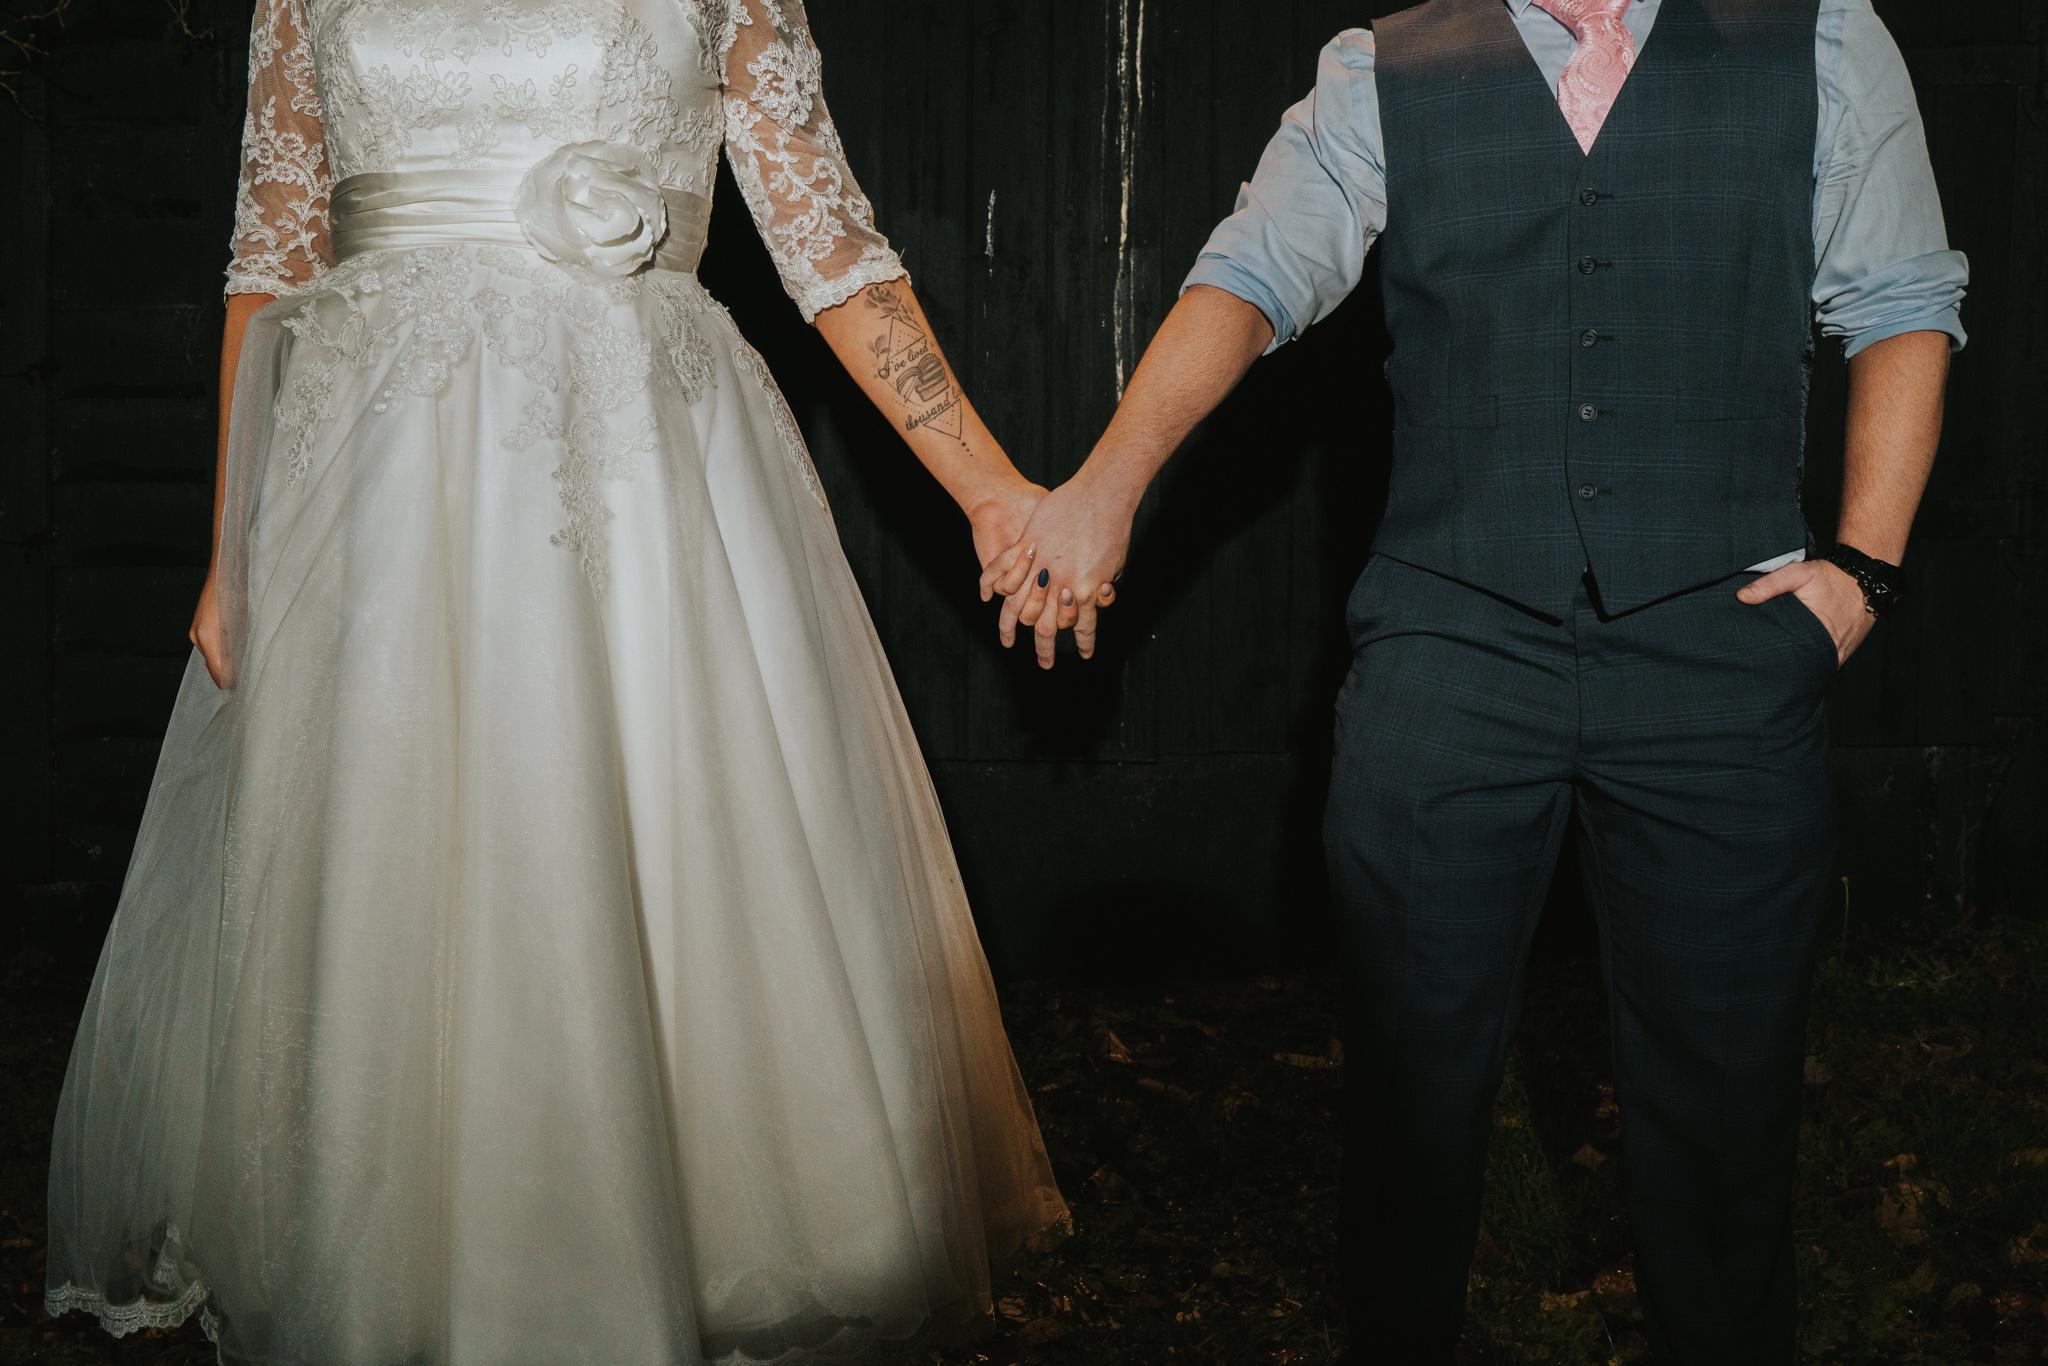 rhia-james-rustic-crabbs-barn-vintage-50s-retro-wedding-grace-elizabeth-colchester-essex-alternative-relaxed-wedding-family-photography-devon-suffolk-norfolk-essex (137 of 138).jpg